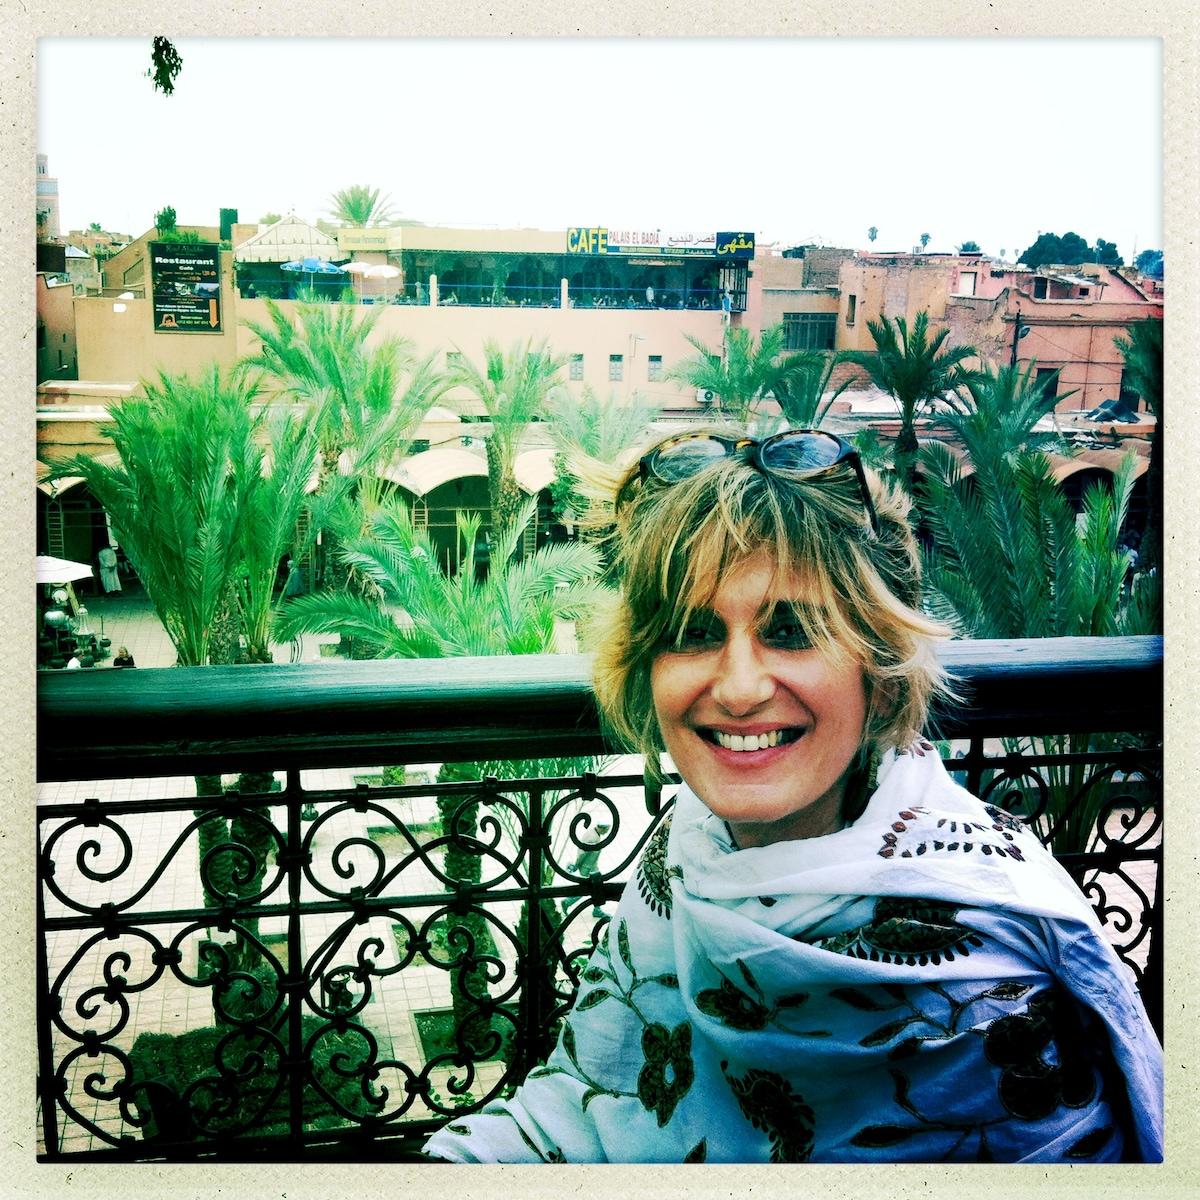 Véronique from Marrakesh